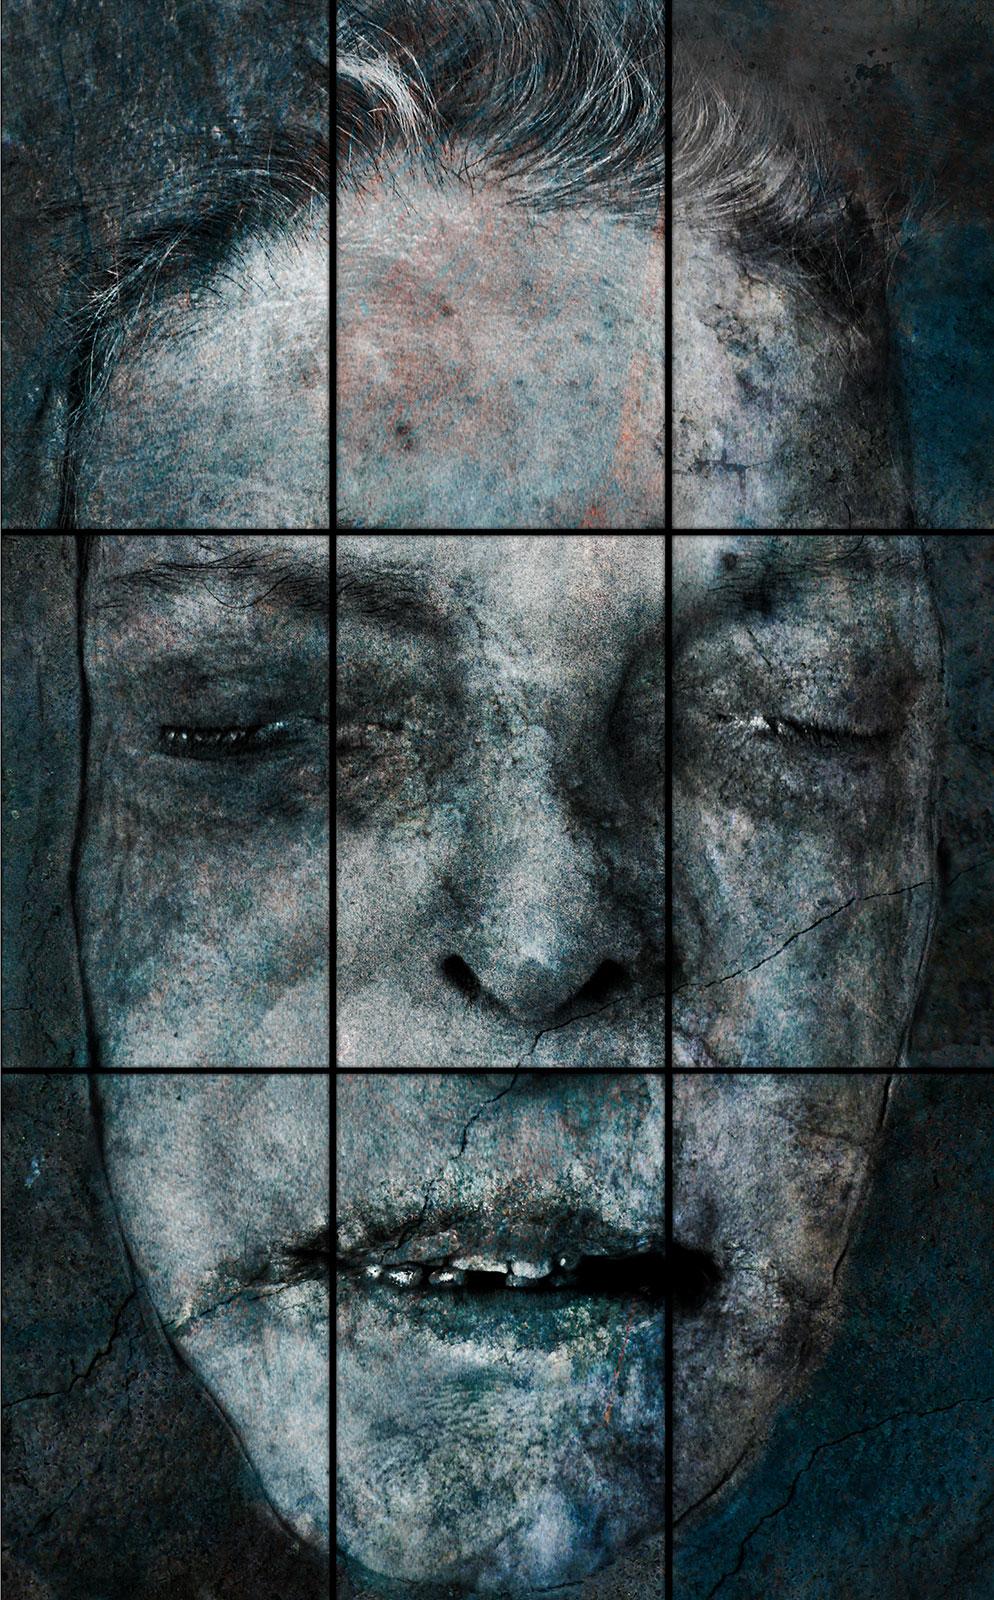 97532, no. 1 (death)  Frank Rodick,2011